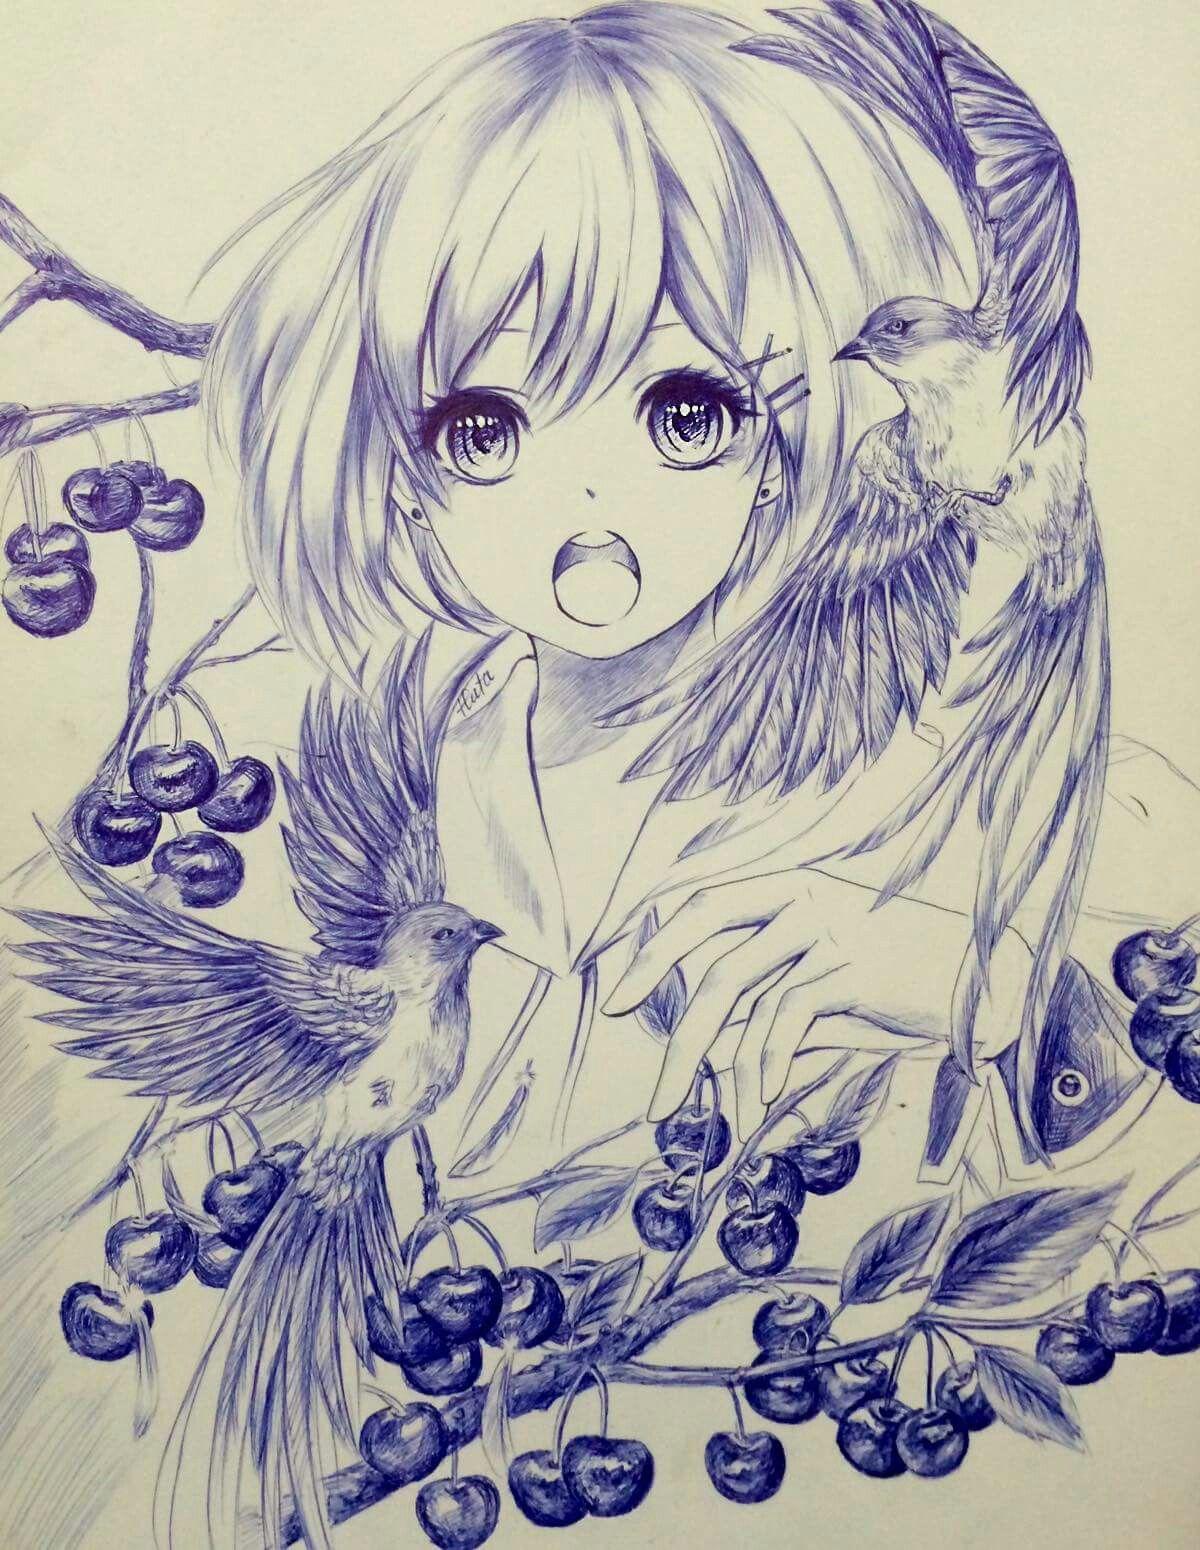 gorgeous anime girl portrait manga style - learn more about wacom